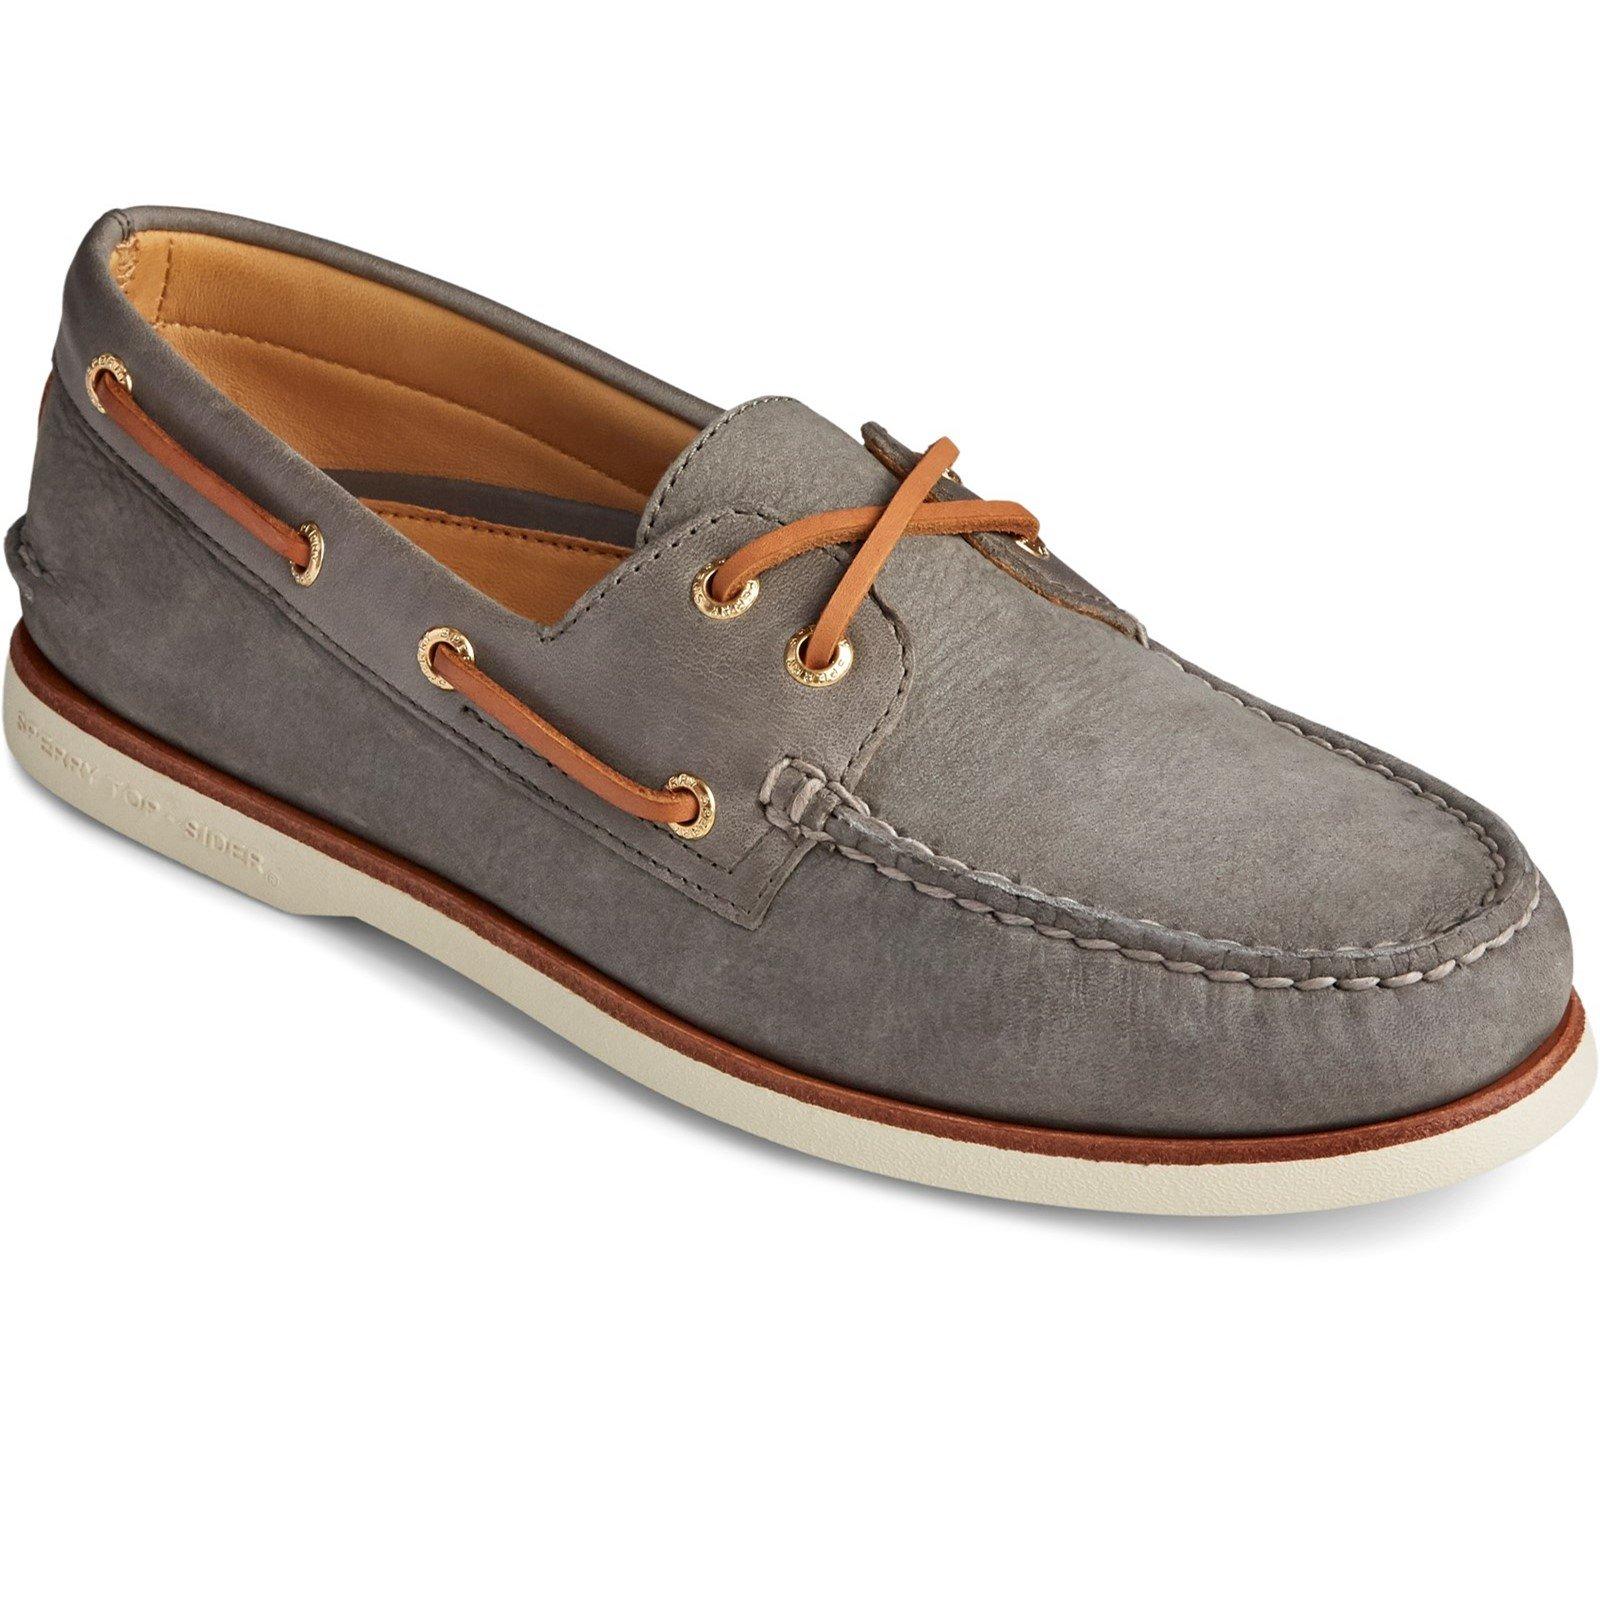 Sperry Men's Authentic Original Seaside Boat Shoe Grey 31529 - Grey 12